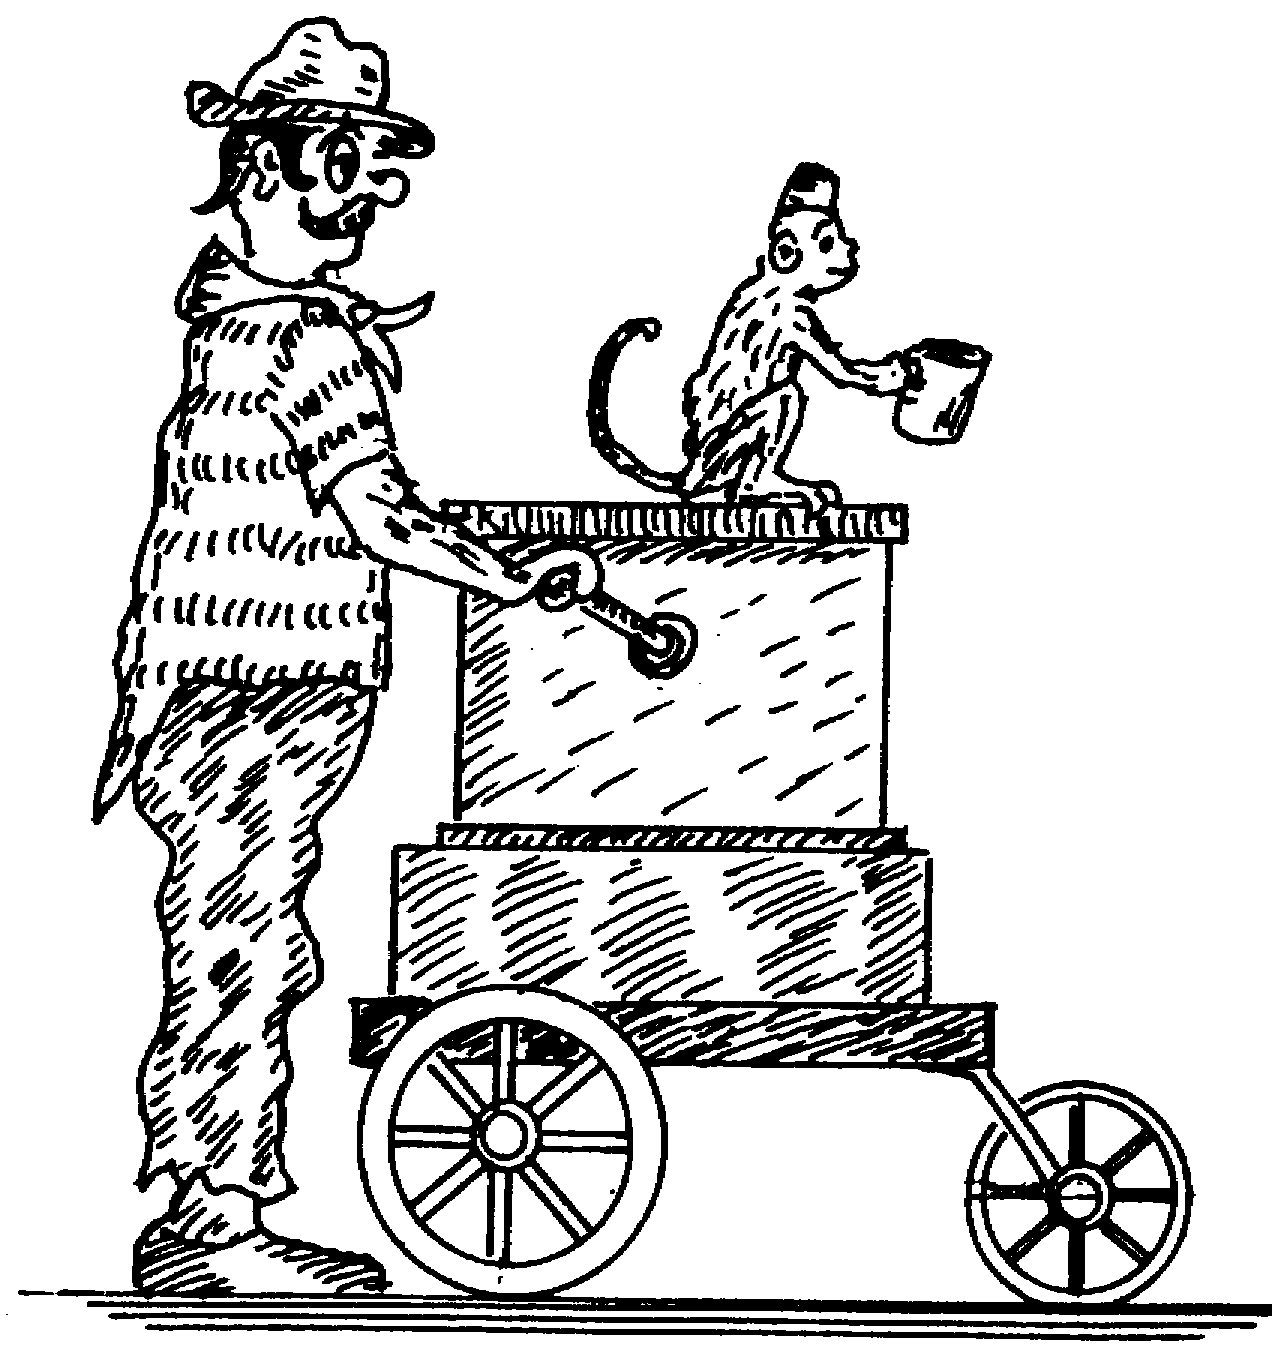 Sketch of Organ grinder